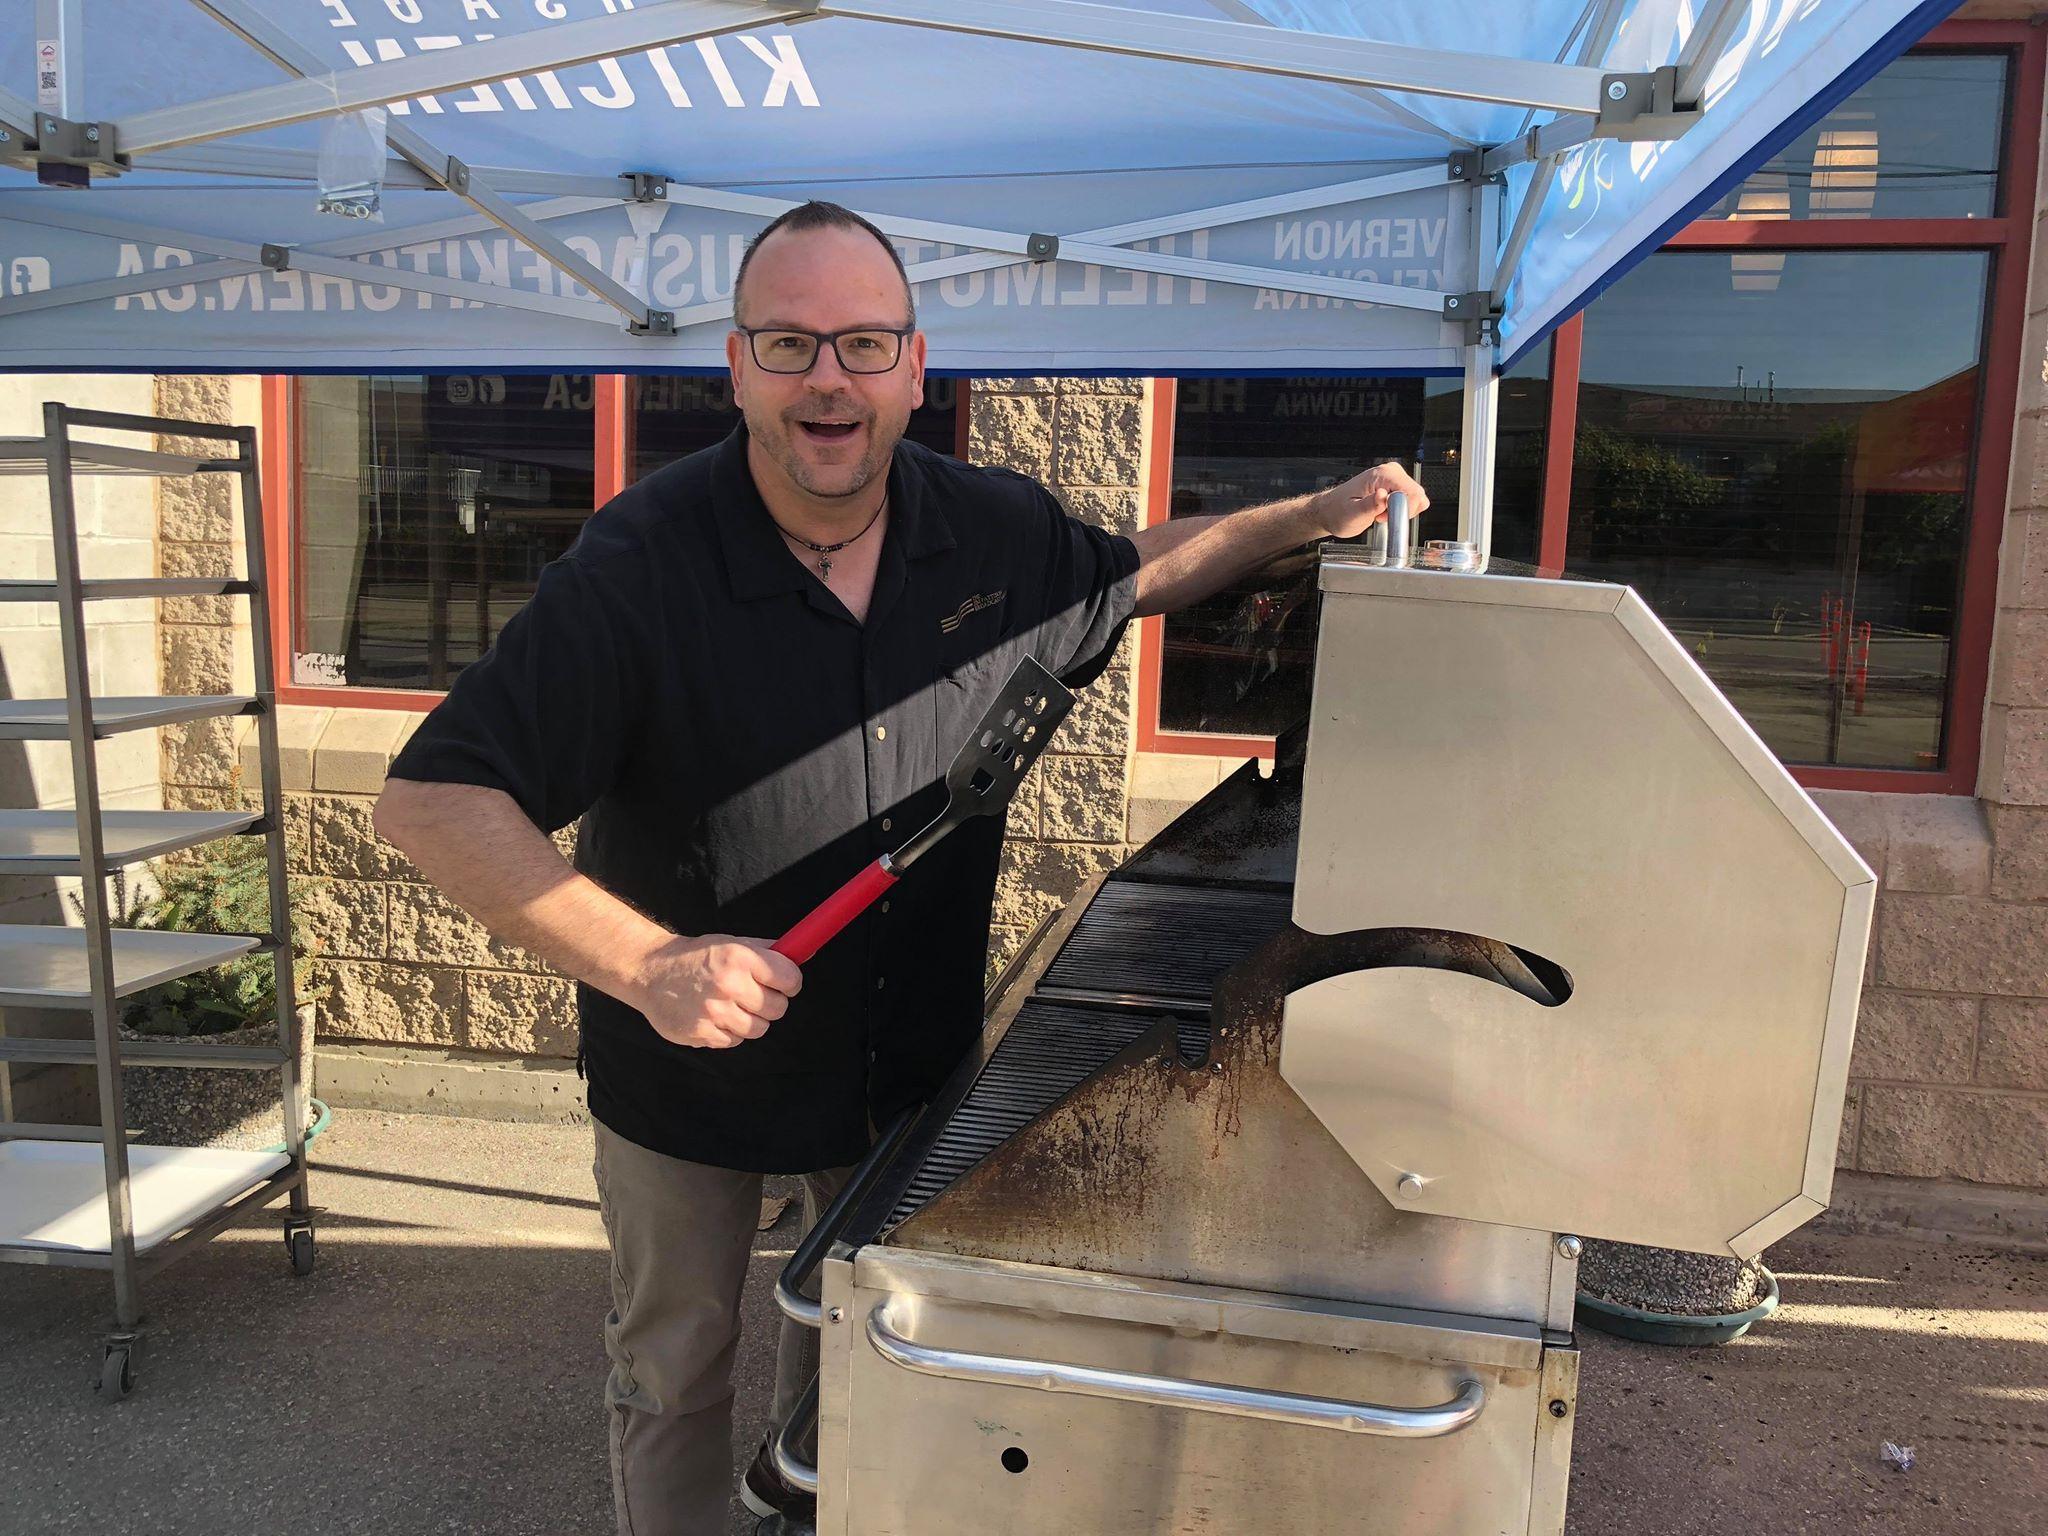 Helmuts Sausage Kitchen Customer Appreciation Day 2018!